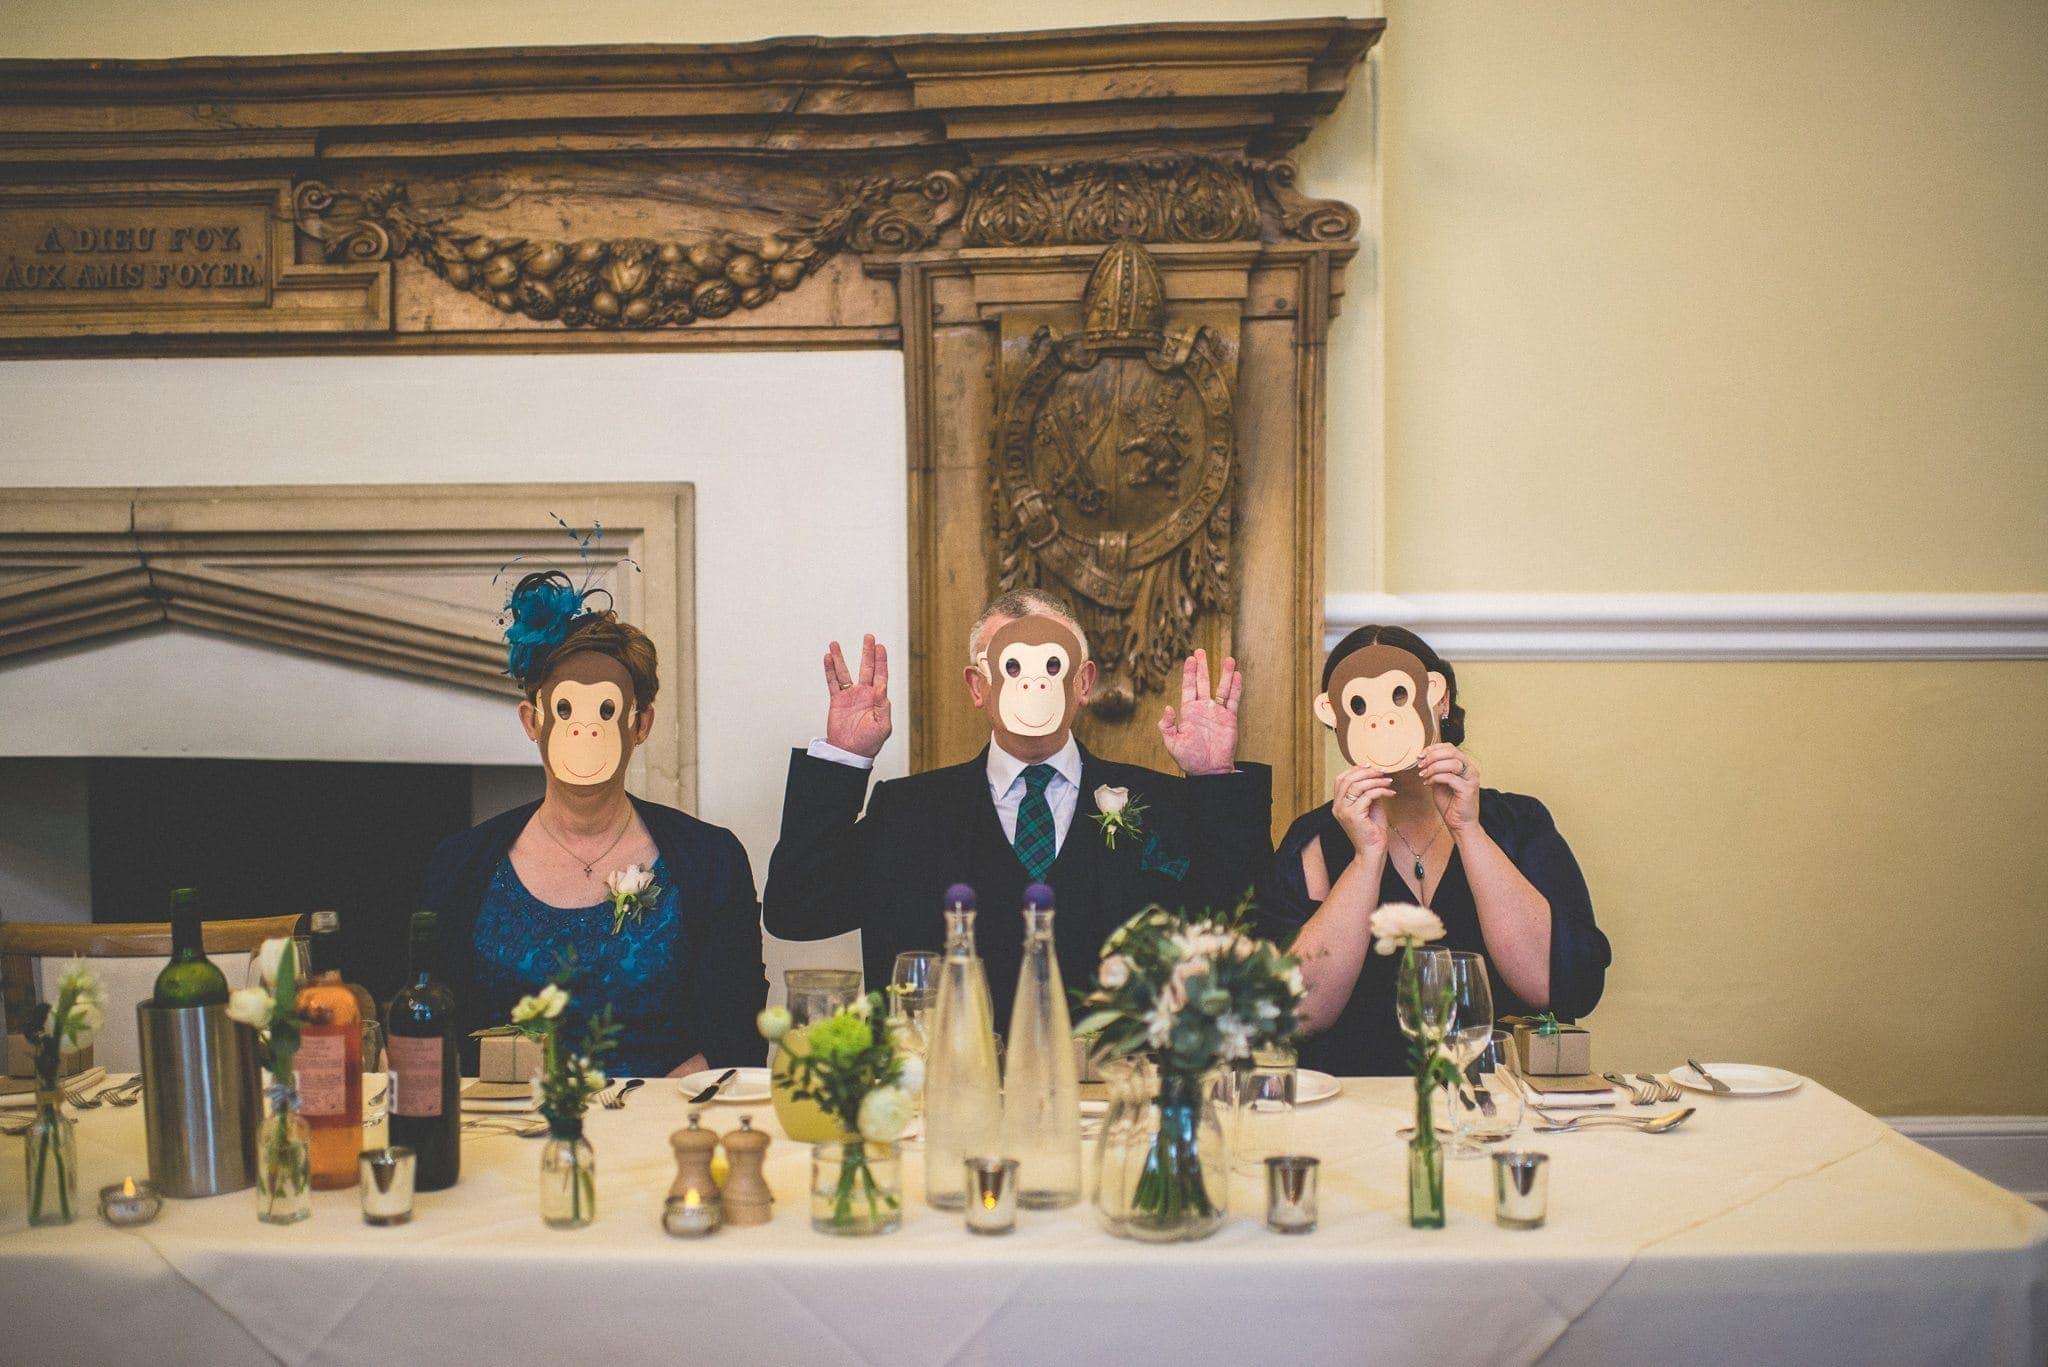 Farnham Castle Wedding guests with monkey masks on